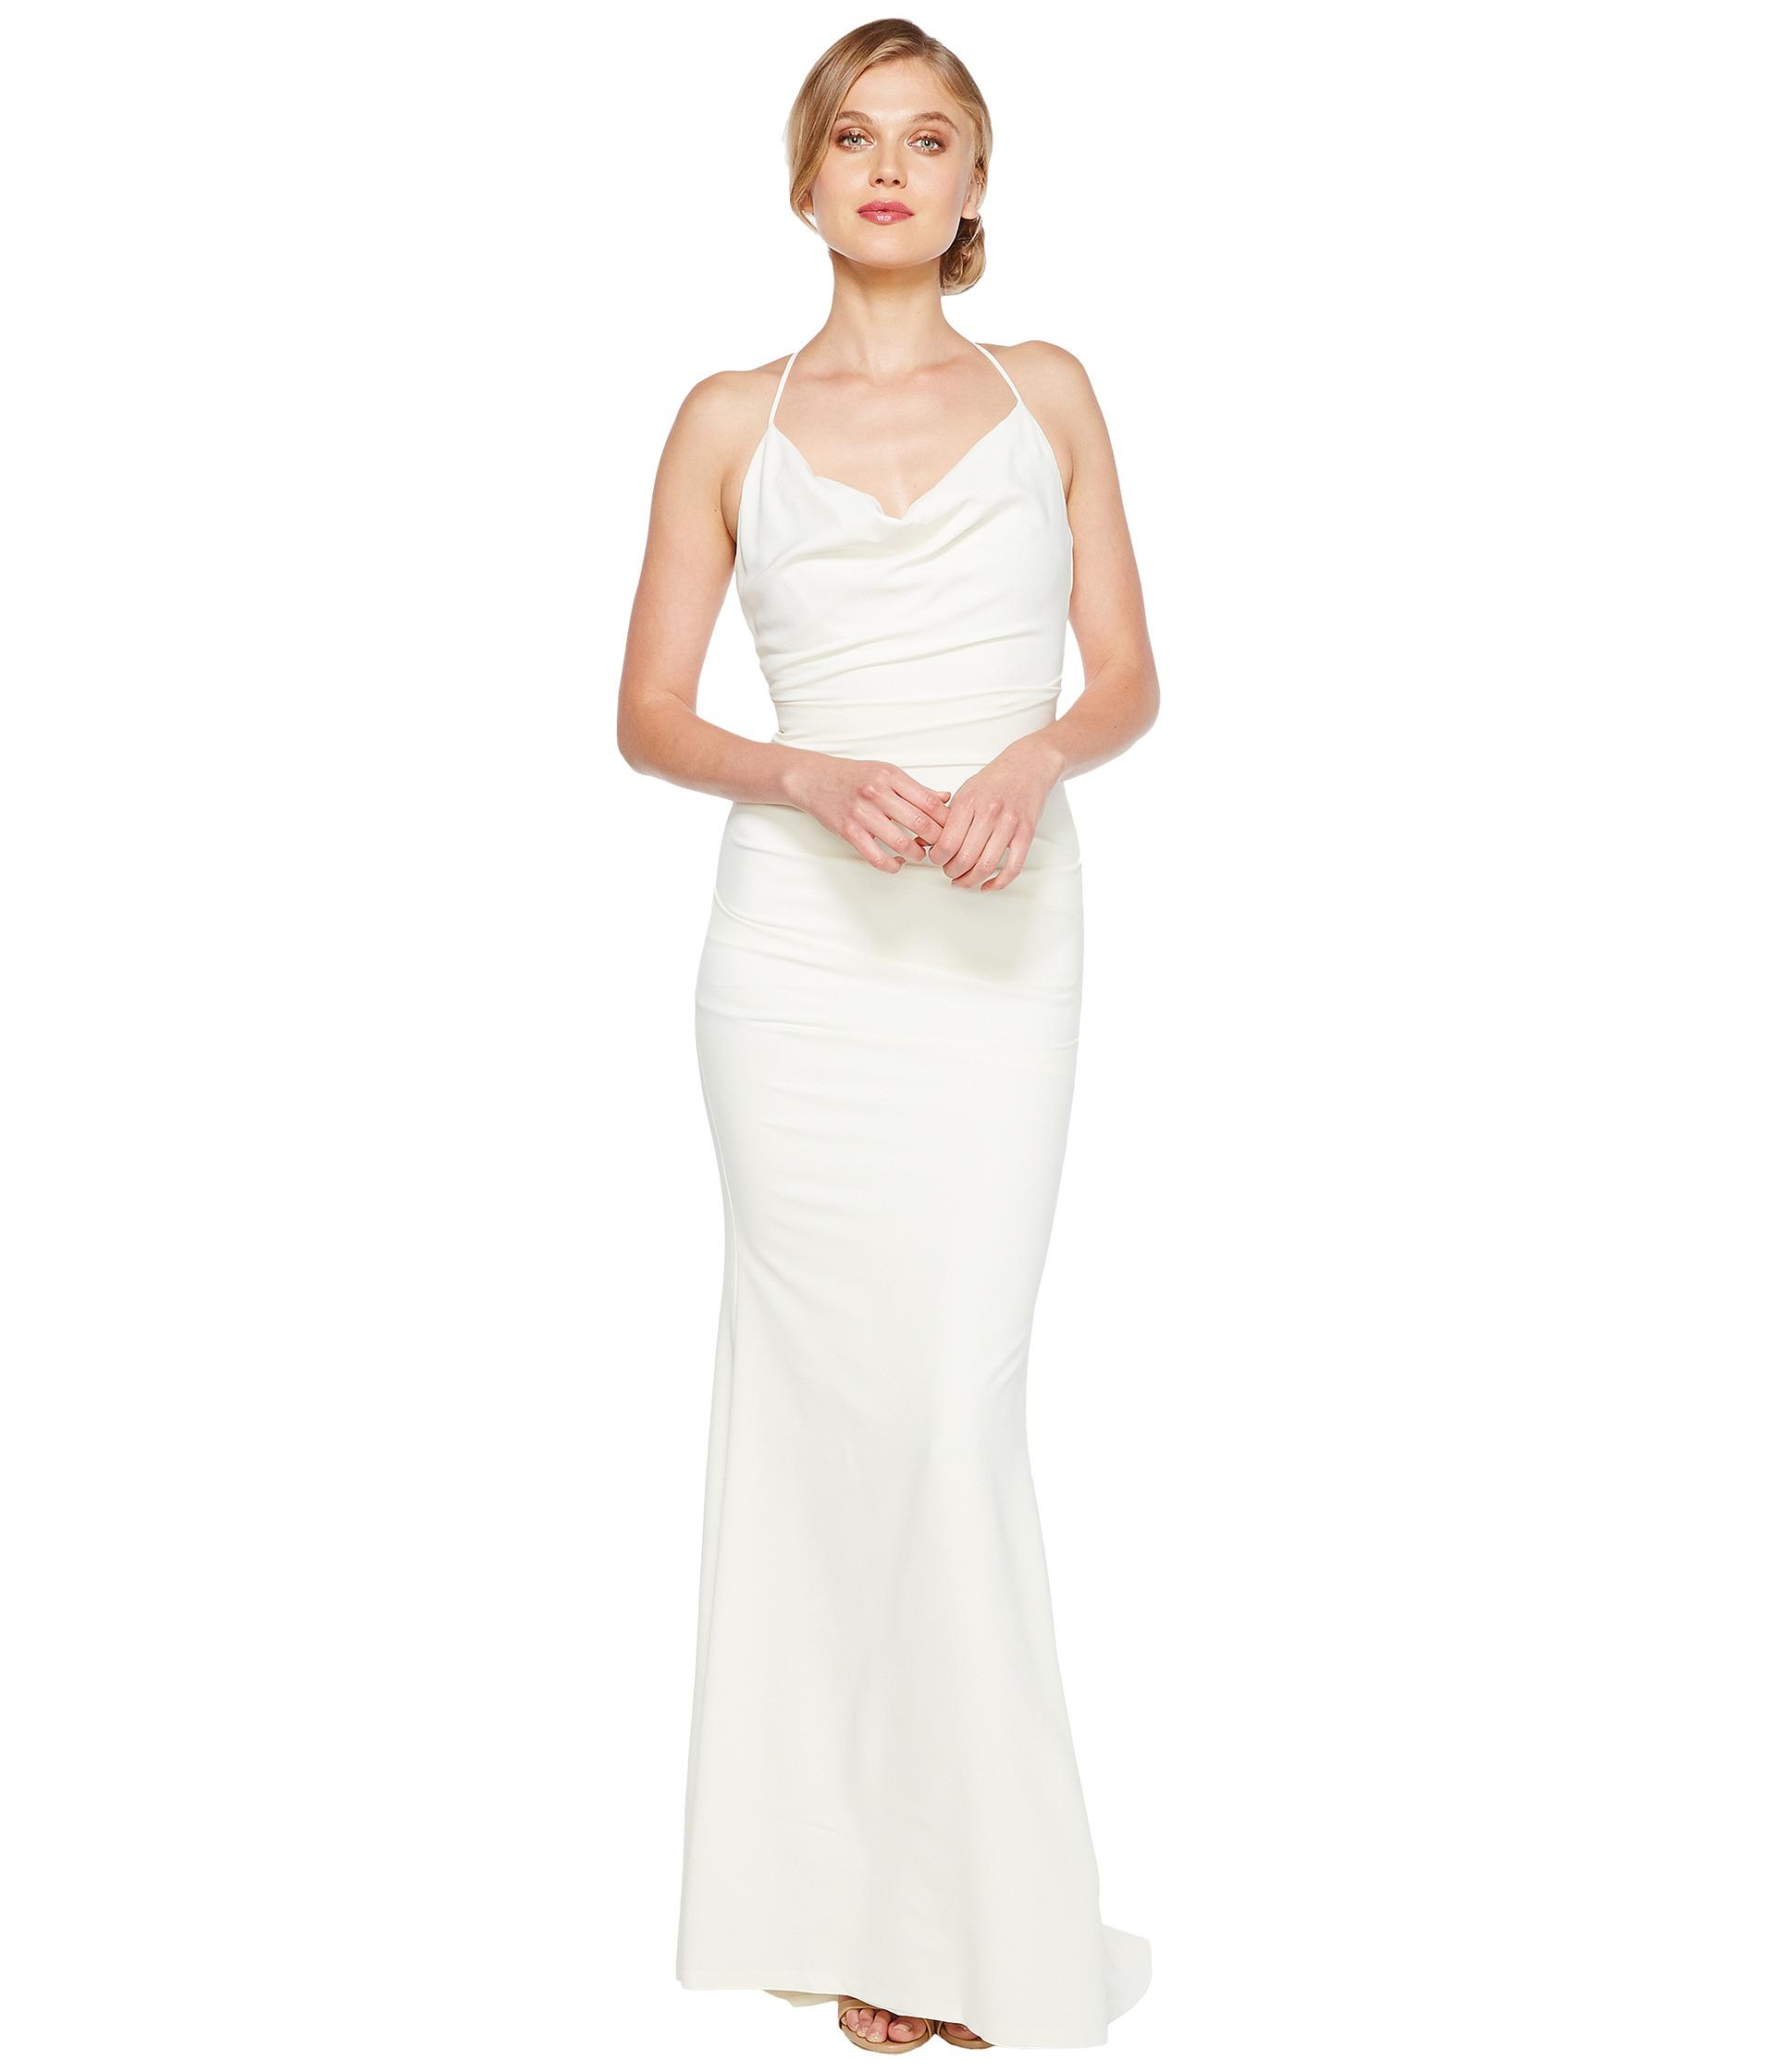 nicole miller sleeveless wedding gown free wedding dresses Nicole Miller Tara Bridal Gown